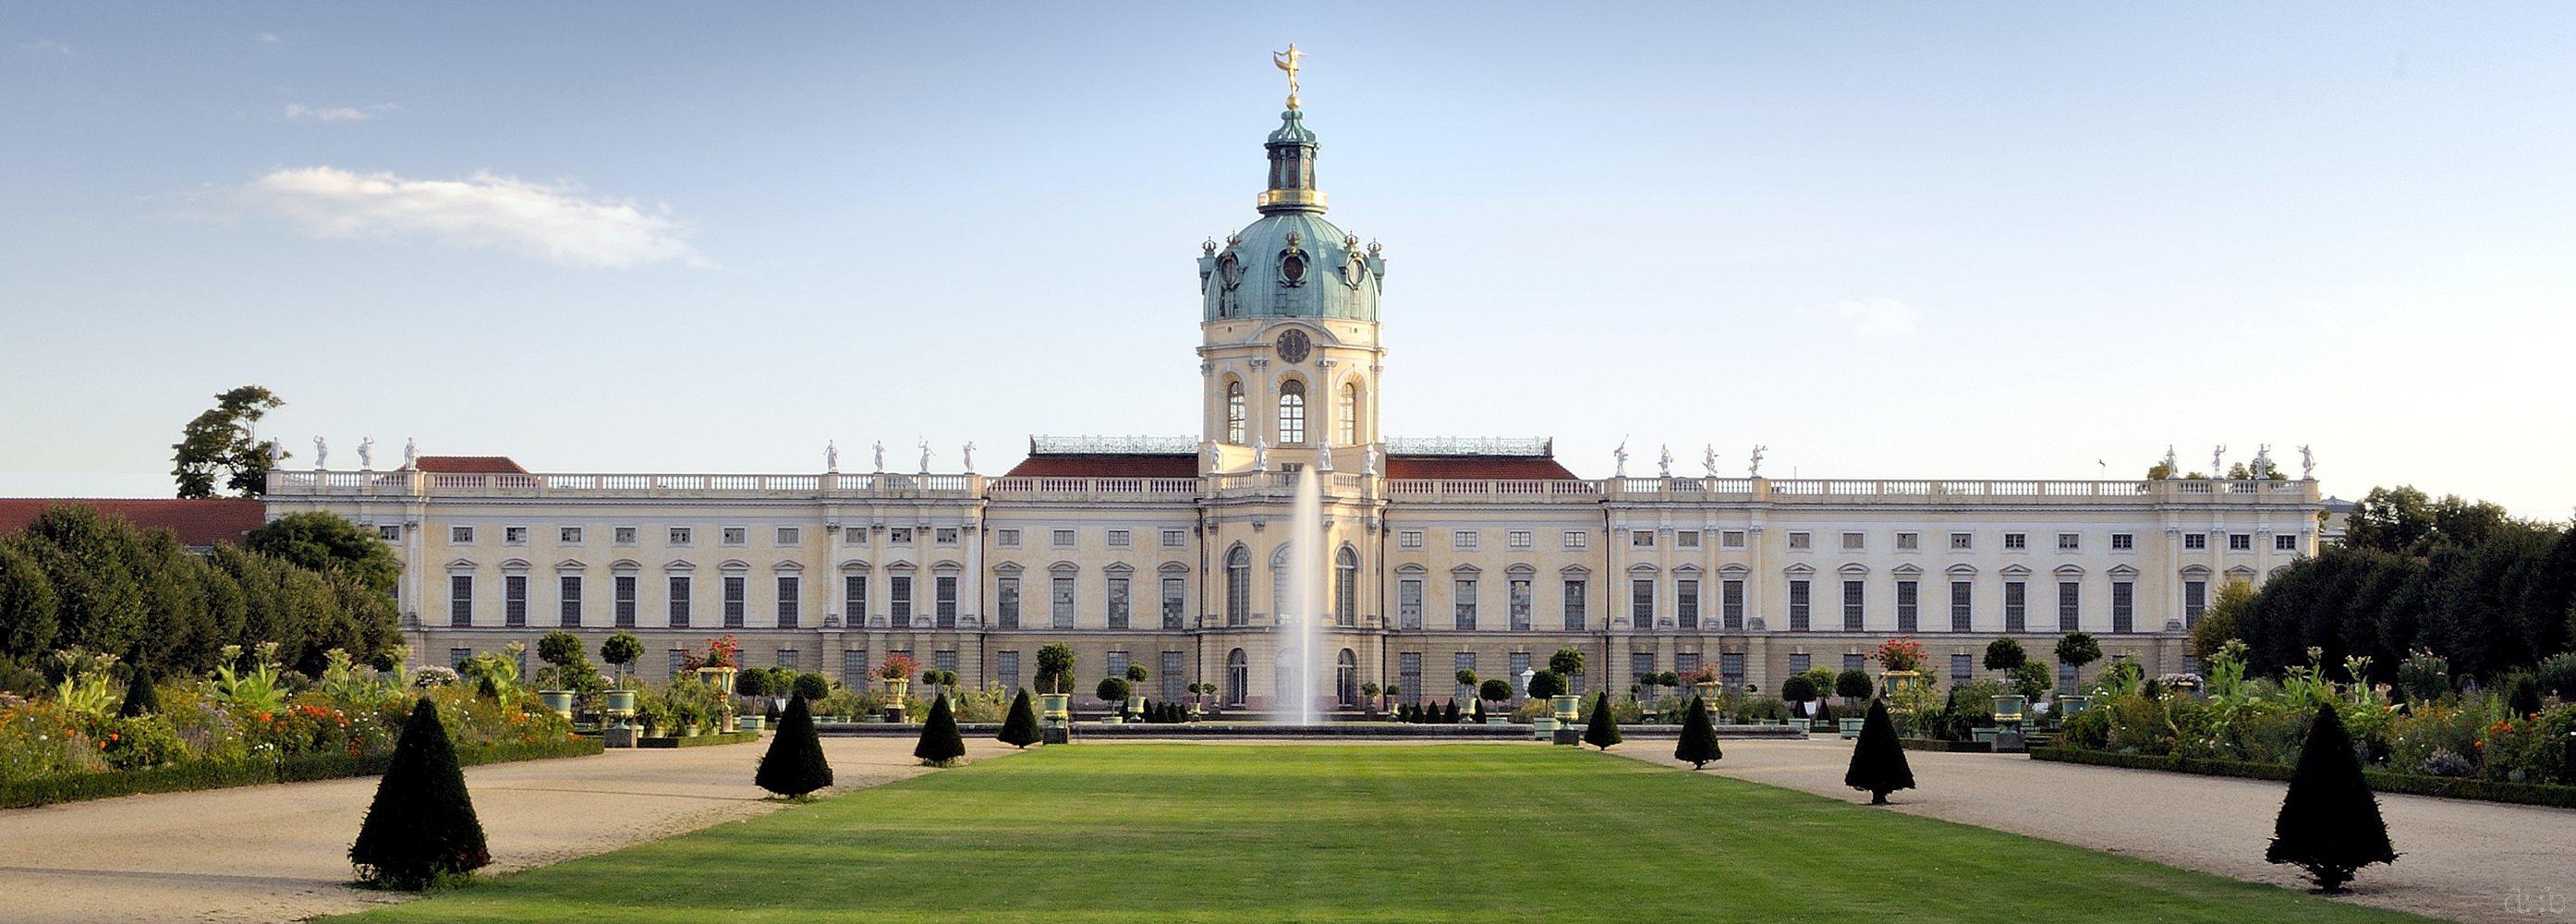 "Berlin's Schloss Charlottenburg, seen from the ""back yard"""